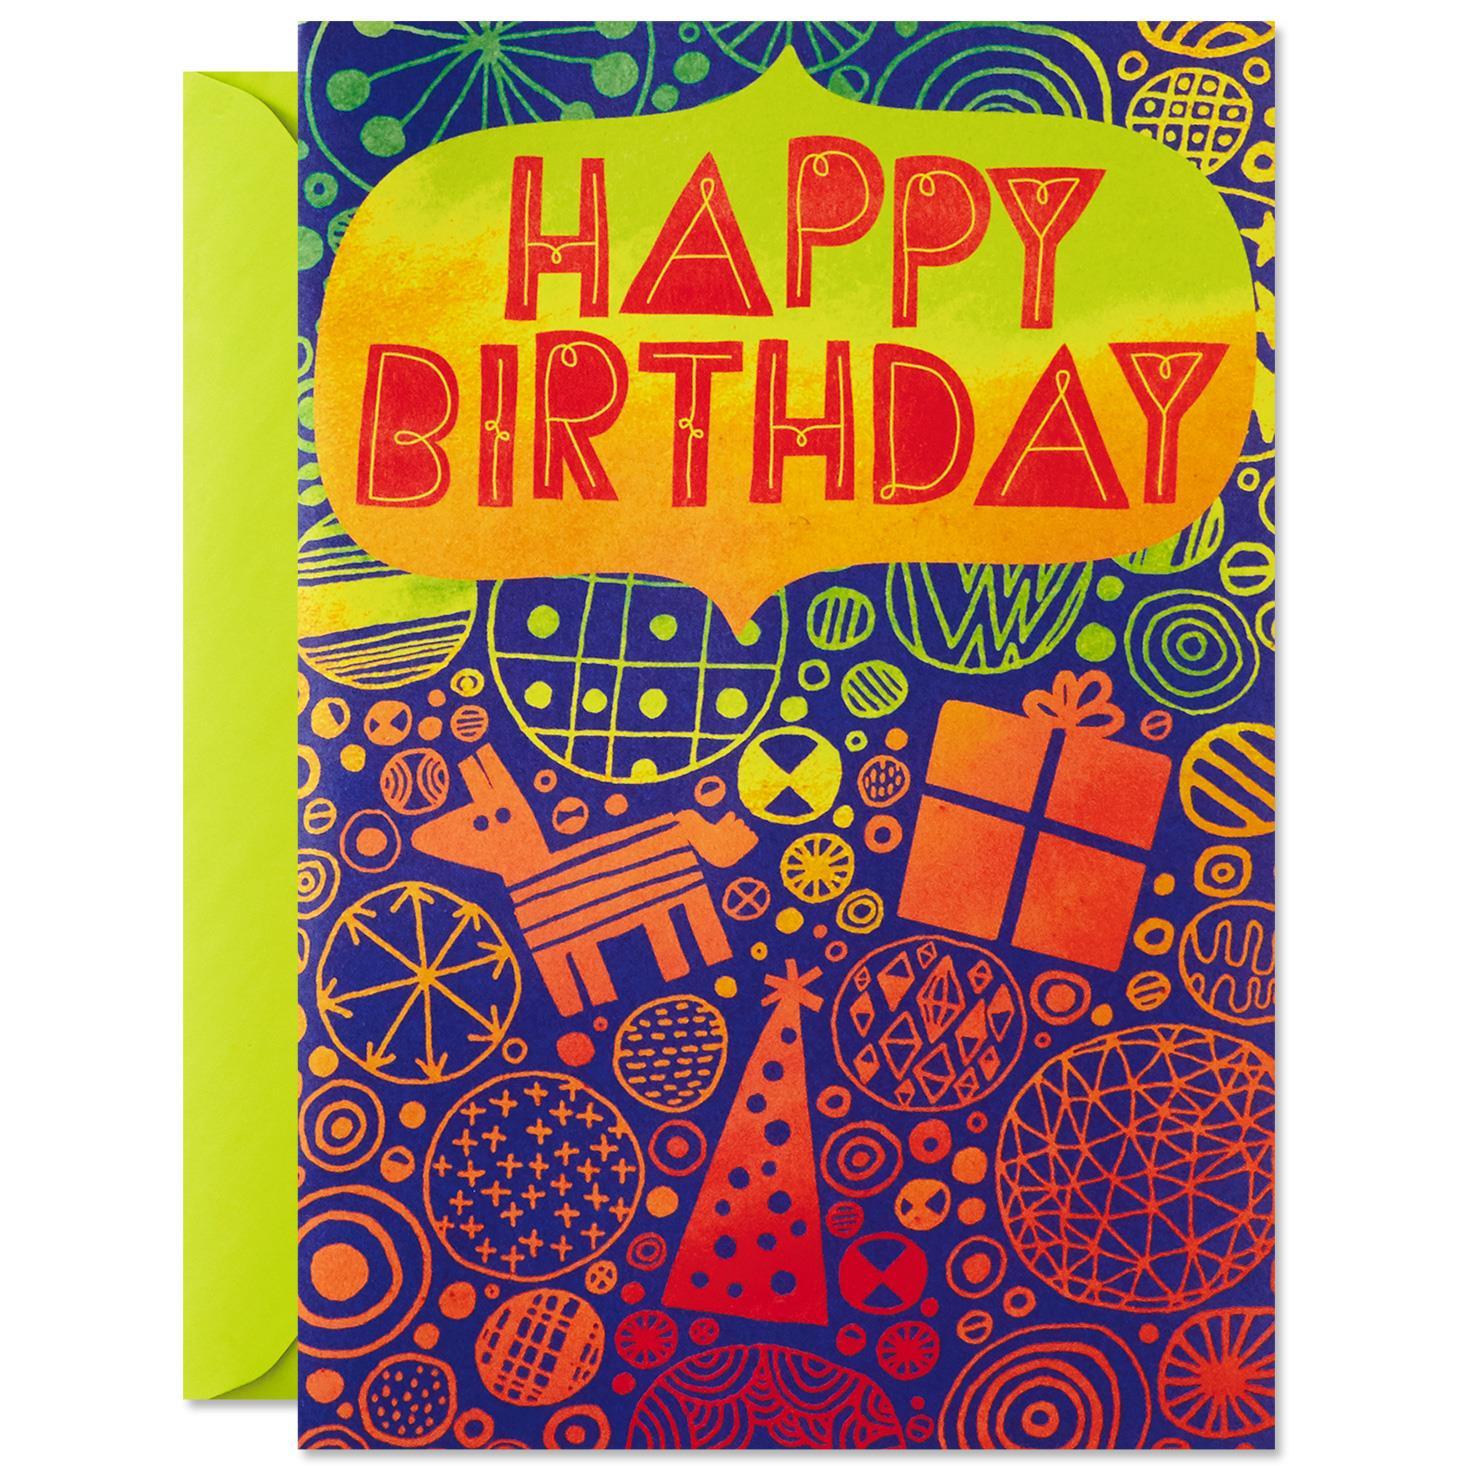 Cake Surprise Pop Up Musical Birthday Card Greeting